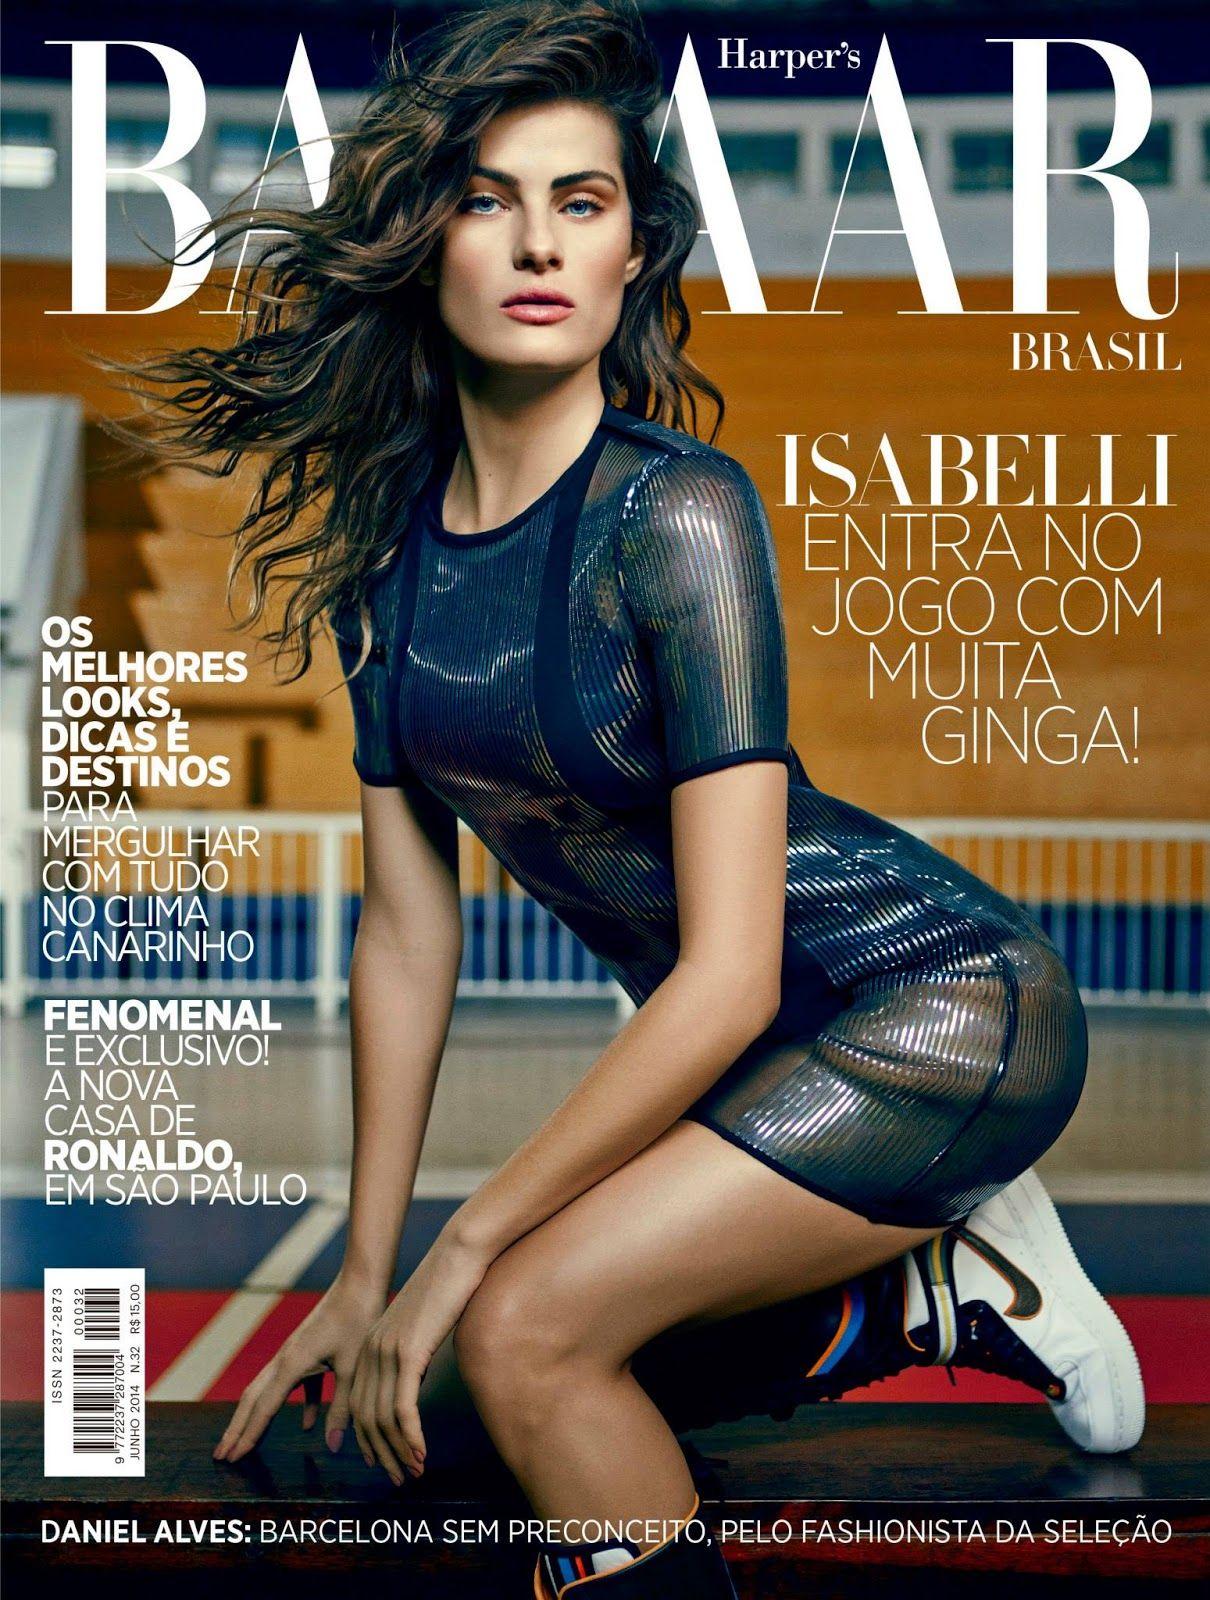 Jogadora De Elite: Isabeli Fontana By Fabio Bartelt For Harper's Bazaar Brazil June 2014